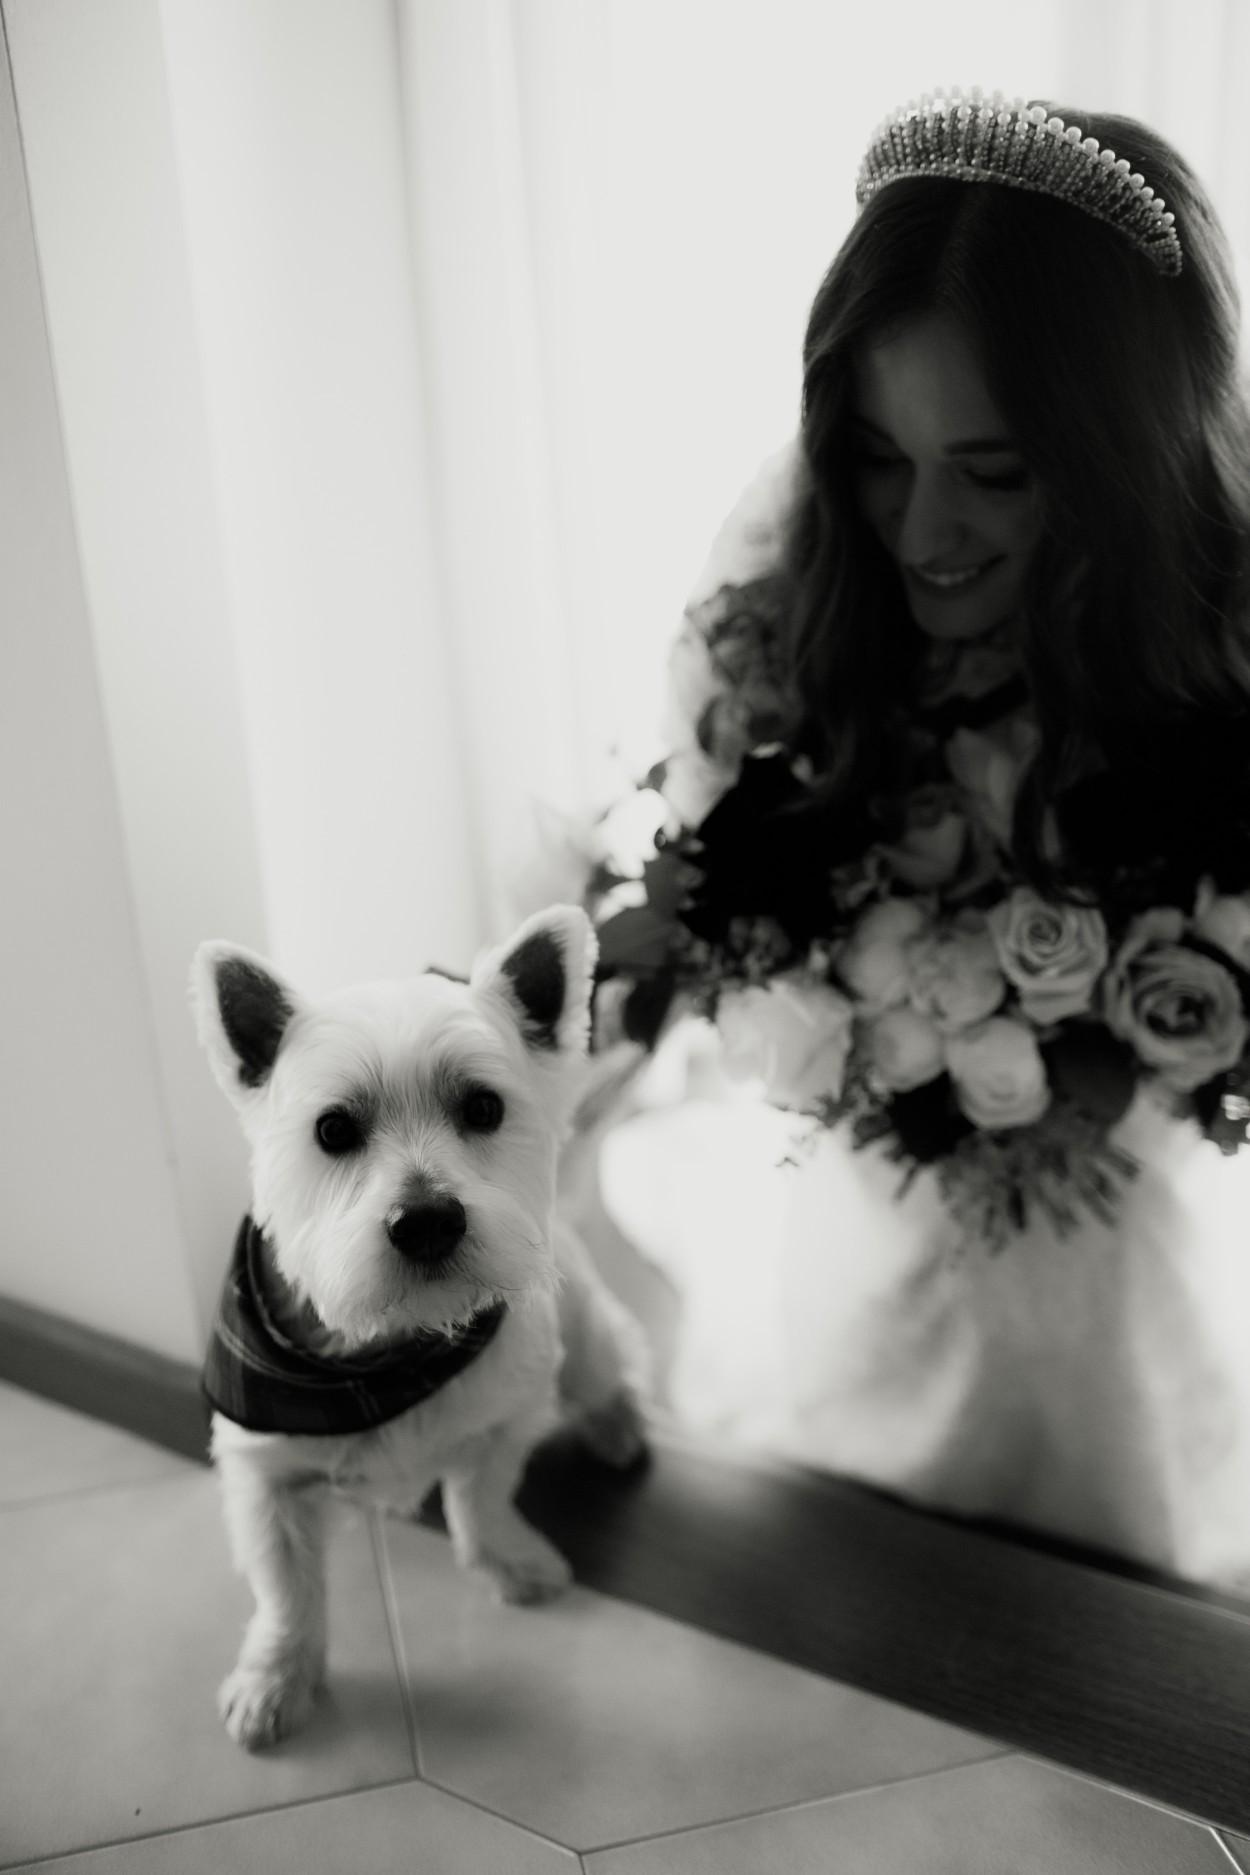 I-Got-You-Babe-Weddings-The-020George-Ballroom-St-Kilda-Wedding-Amy-Abhi.jpg